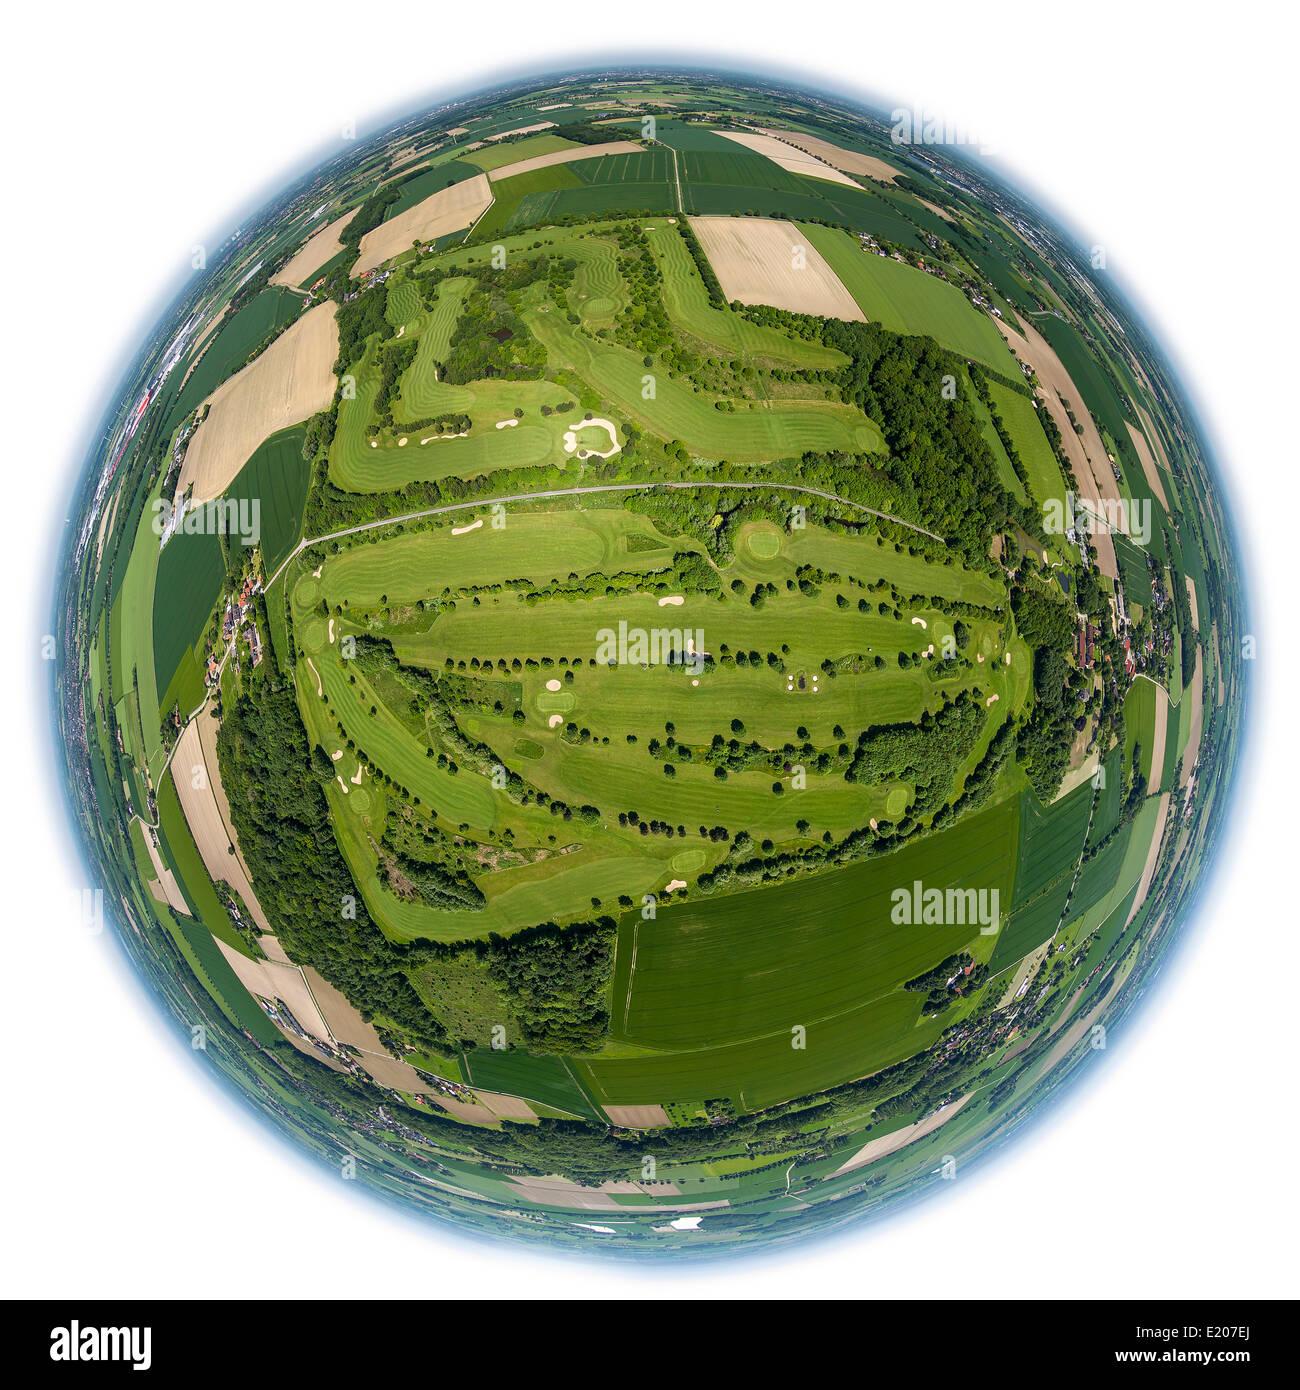 Aerial view, fisheye, Golf Course Hamm, Golfclub Hamm Drechen, Hamm, Ruhr district, North Rhine-Westphalia, Germany - Stock Image